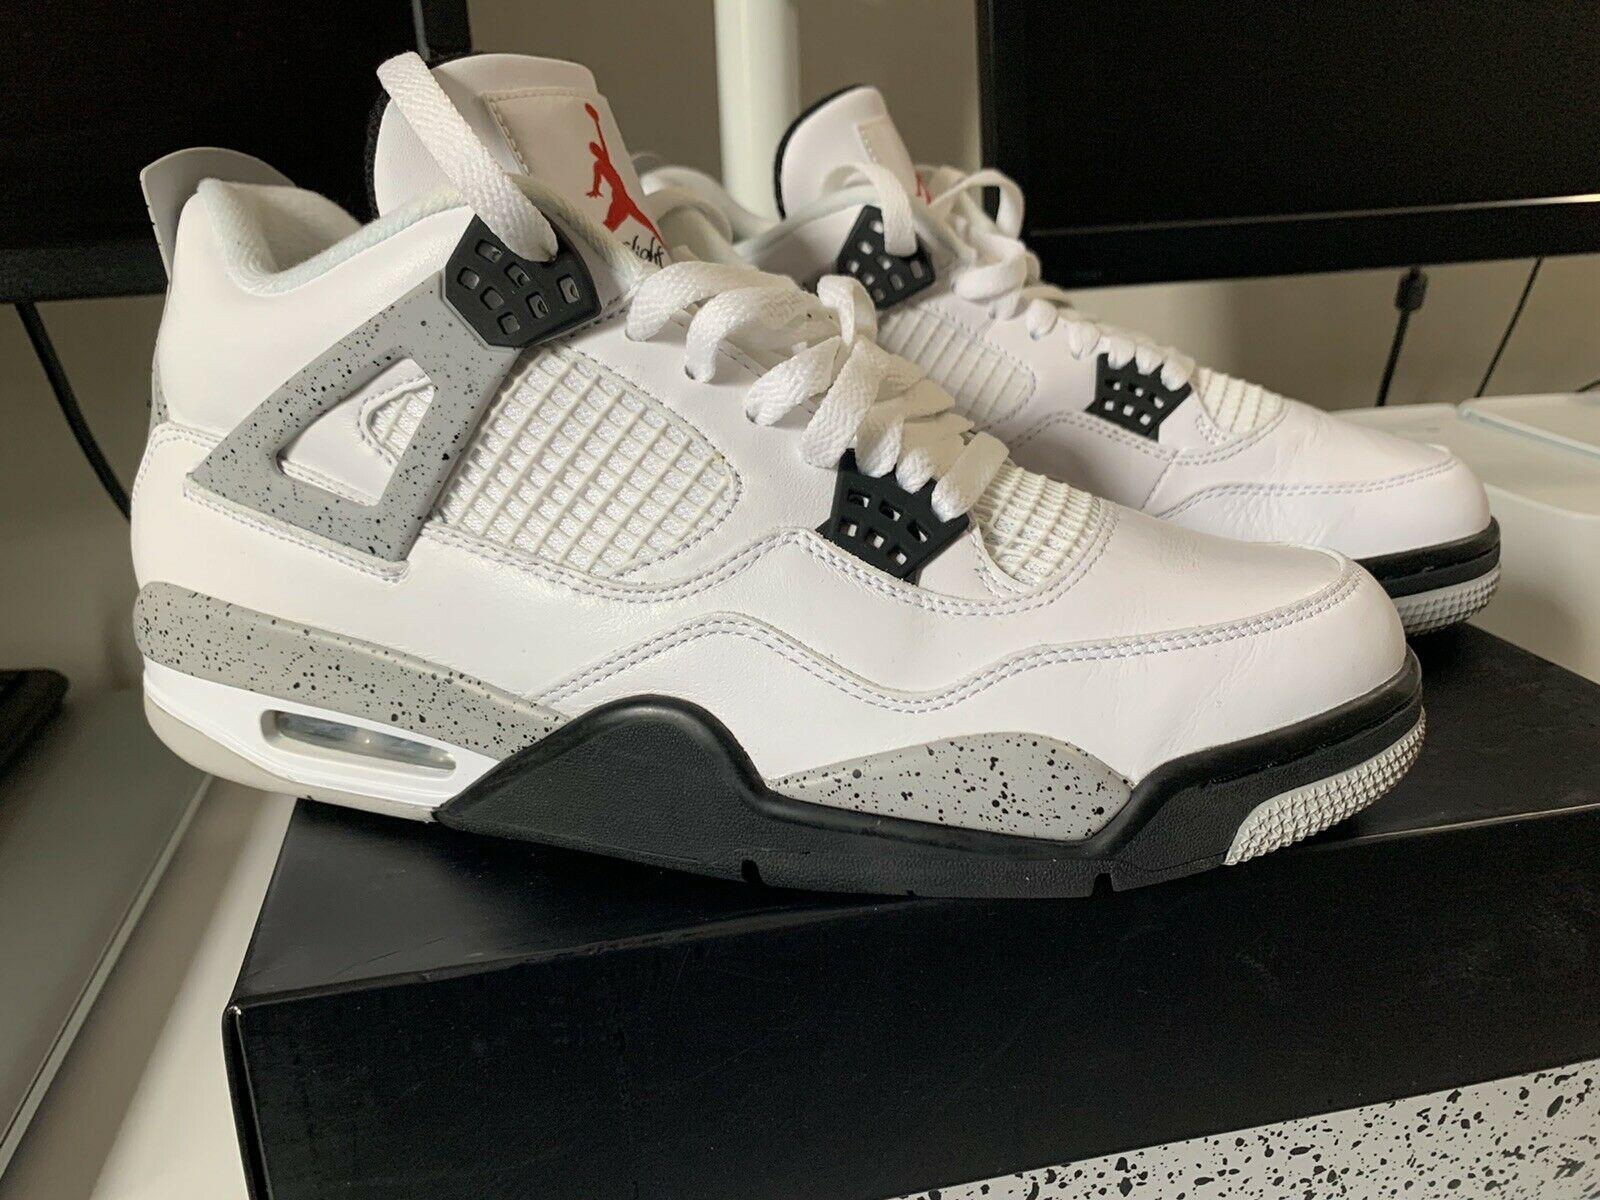 Jordan 4 Retro White Cement 2016